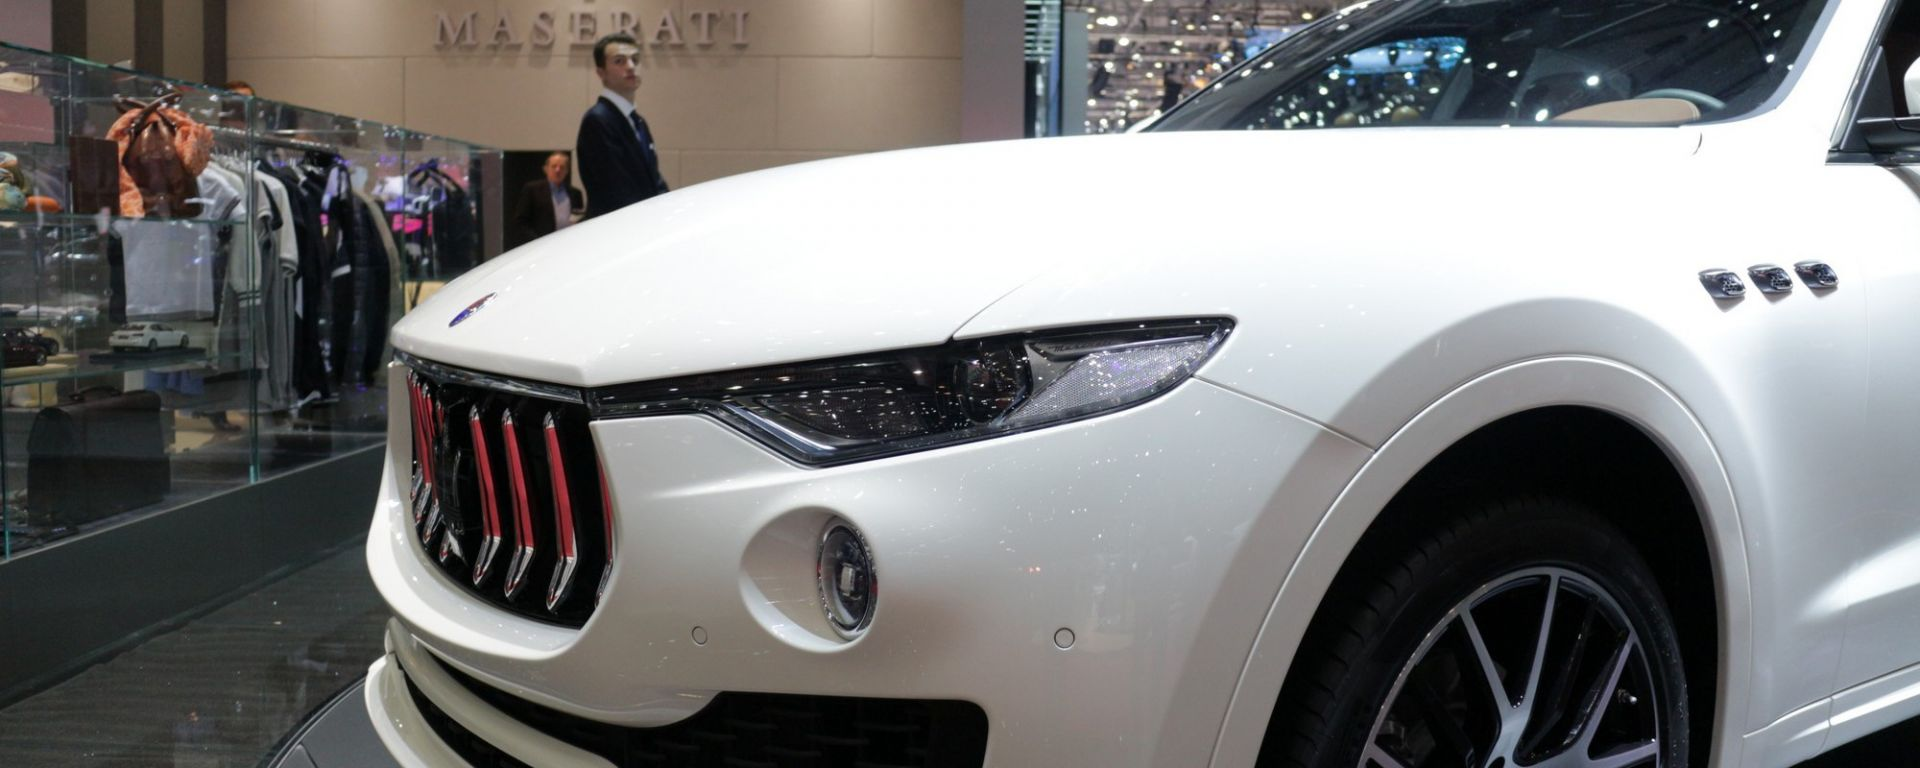 Ginevra 2016: Maserati Levante